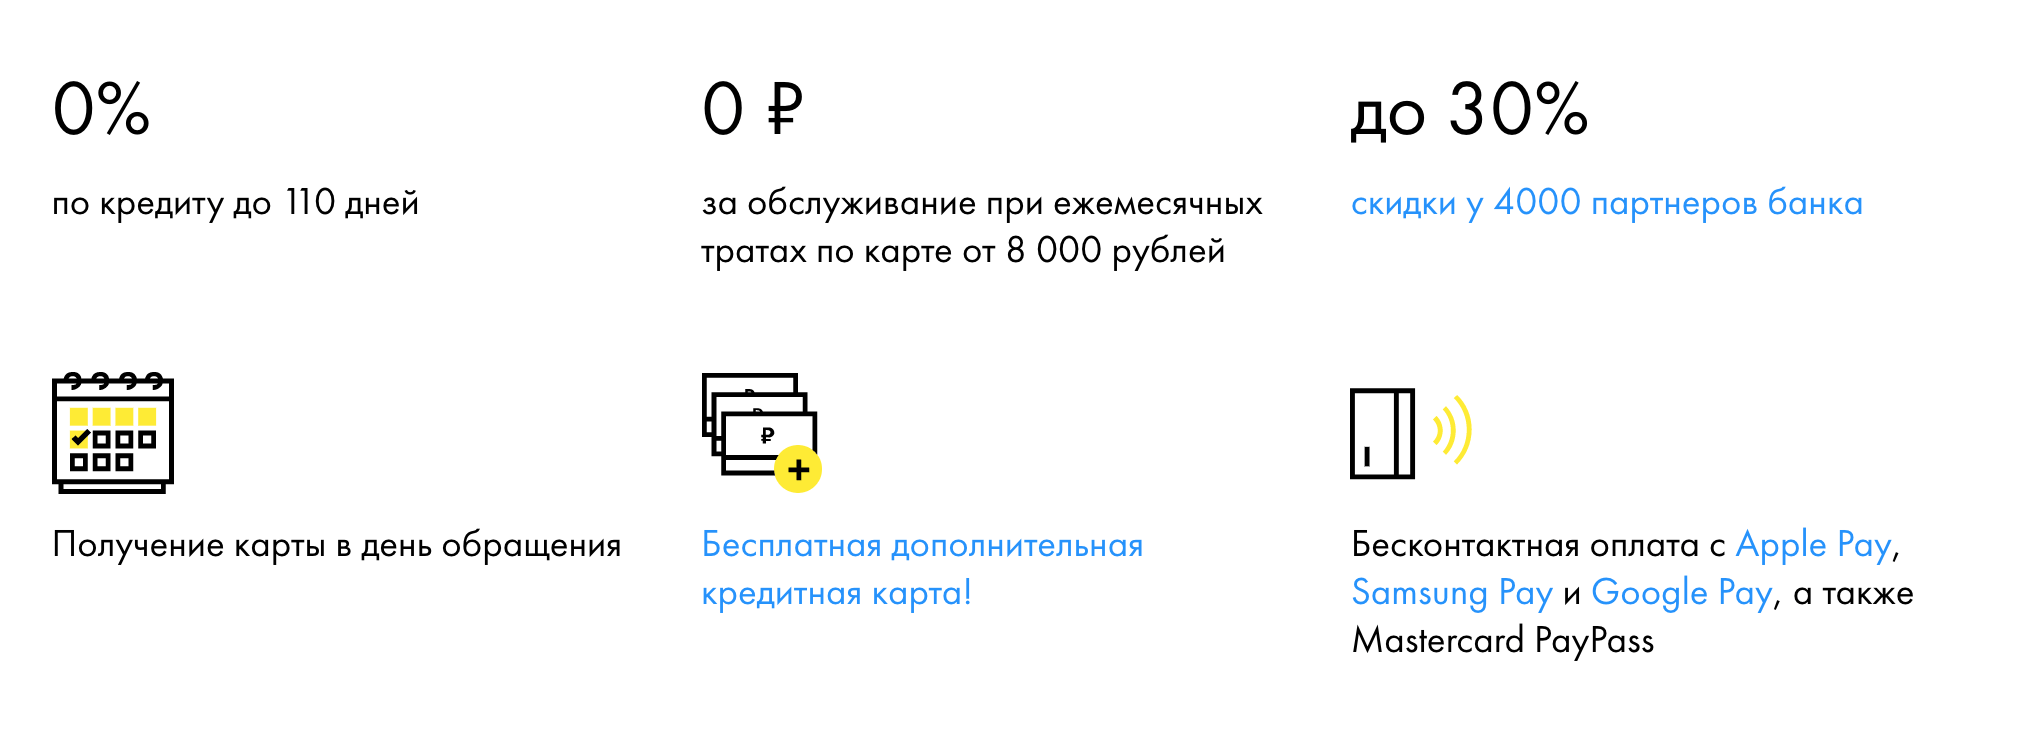 райффайзен банк кредитная карта все сразу